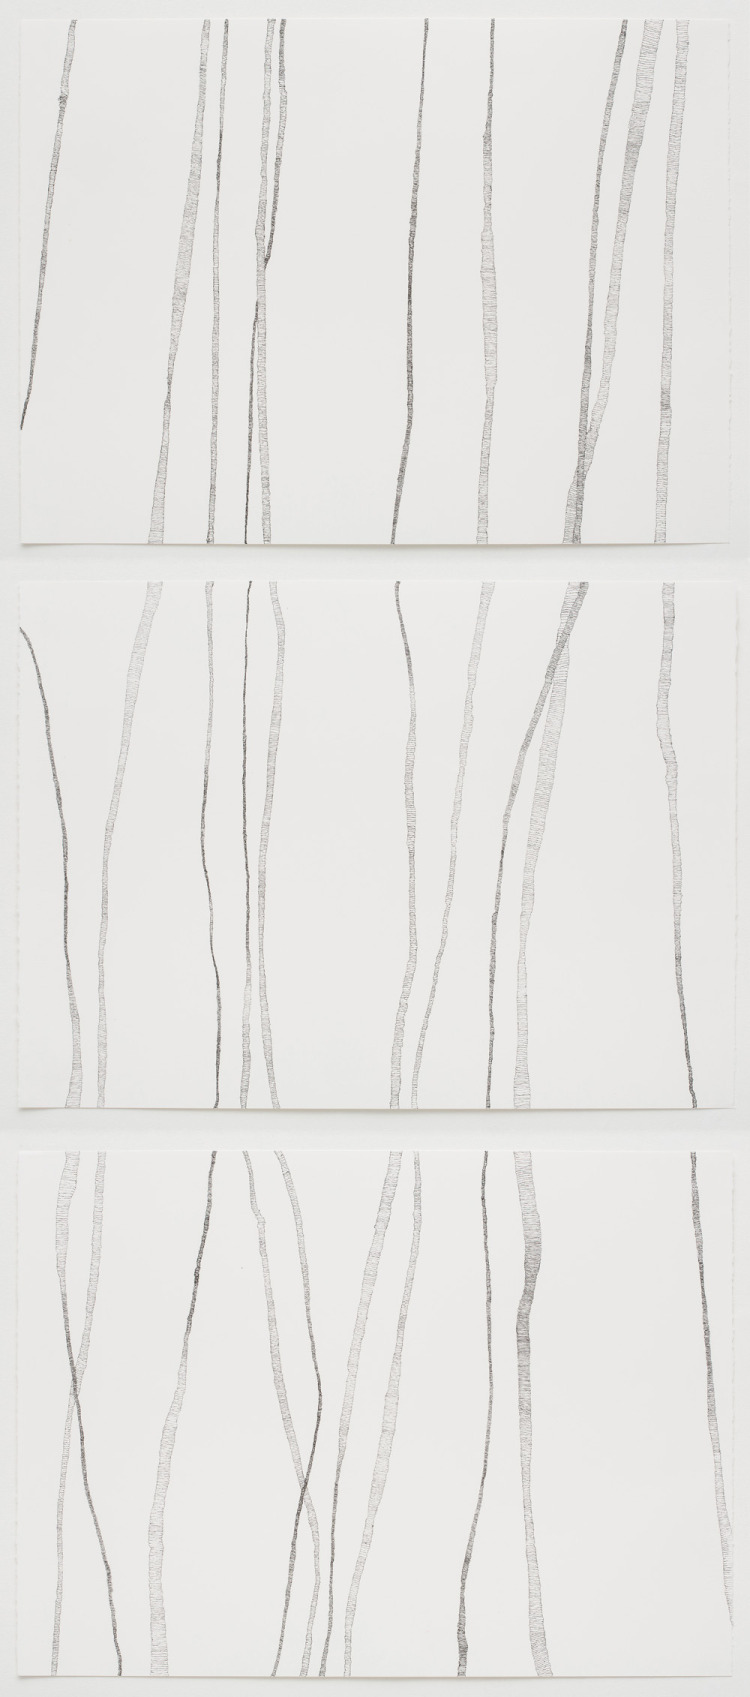 Drawn paper three Lines (triptych) Brenda Drawn on